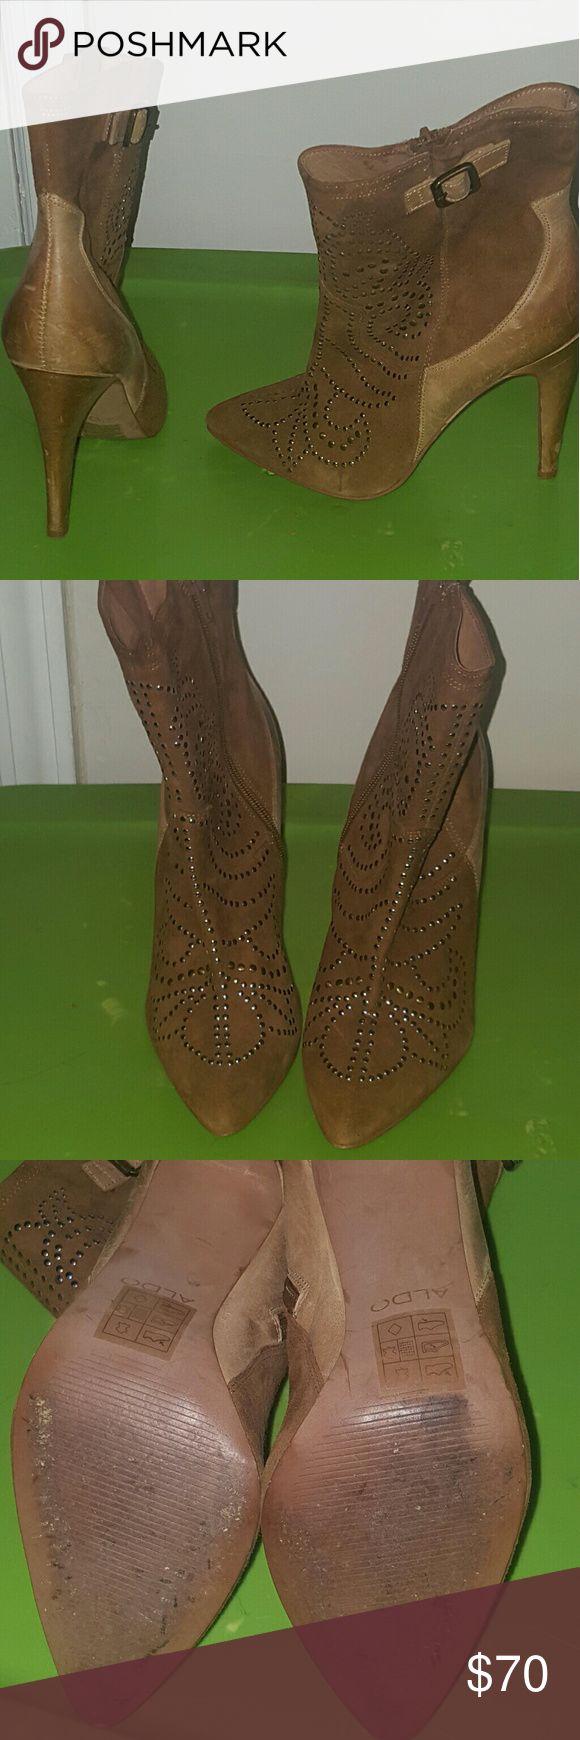 Aldo boots Aldo brown boots size 8.5 Aldo Shoes Ankle Boots & Booties